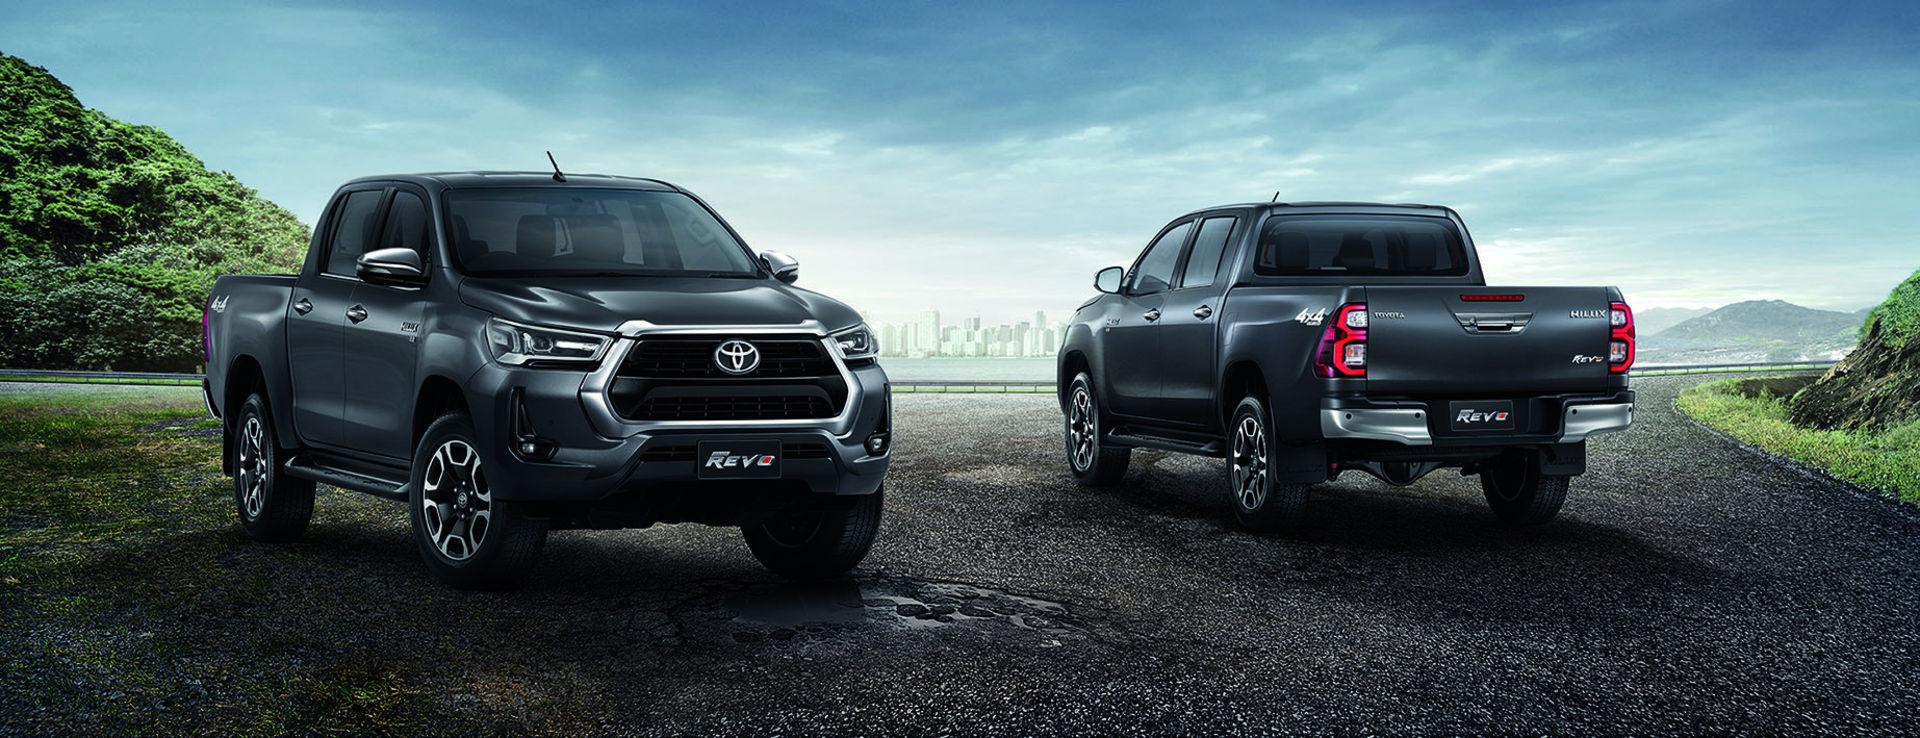 Toyota uppdaterar Hilux